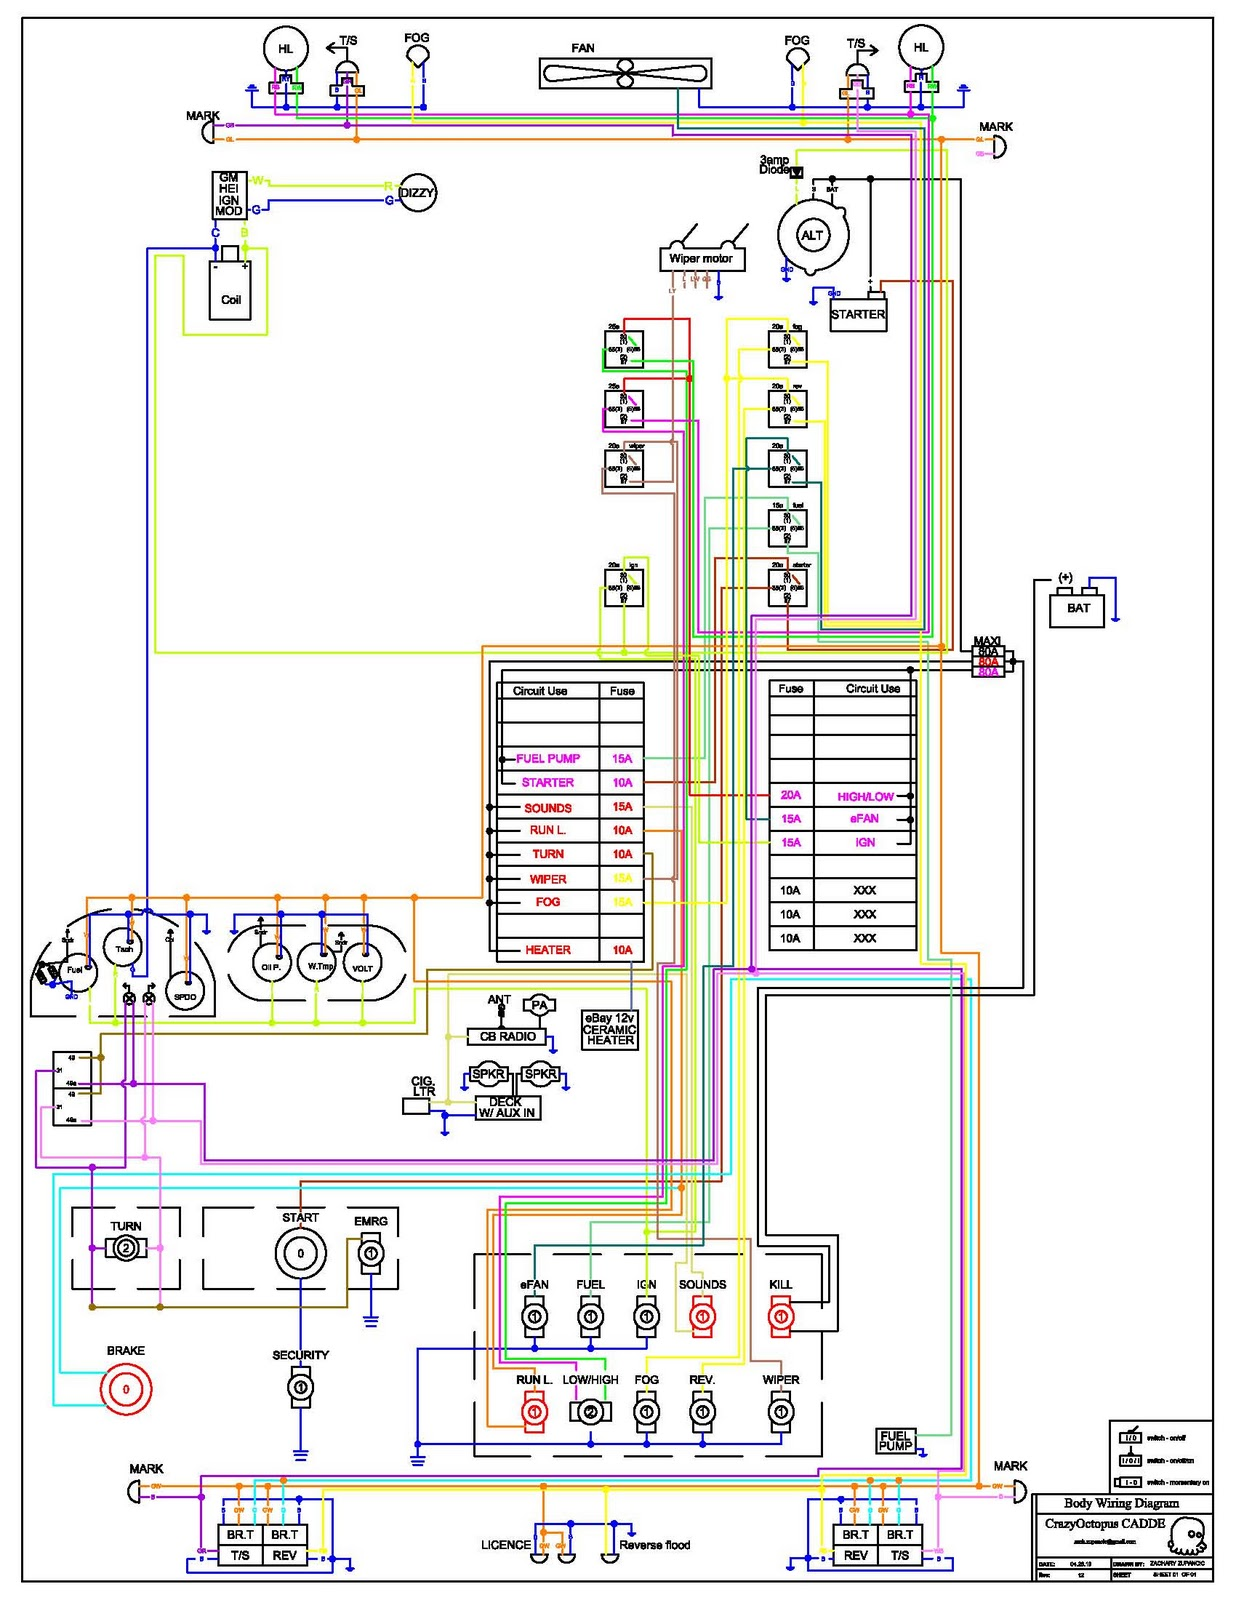 small resolution of my 240z 240z wiring r12 my 240z datsun 240z wiring diagram at cita